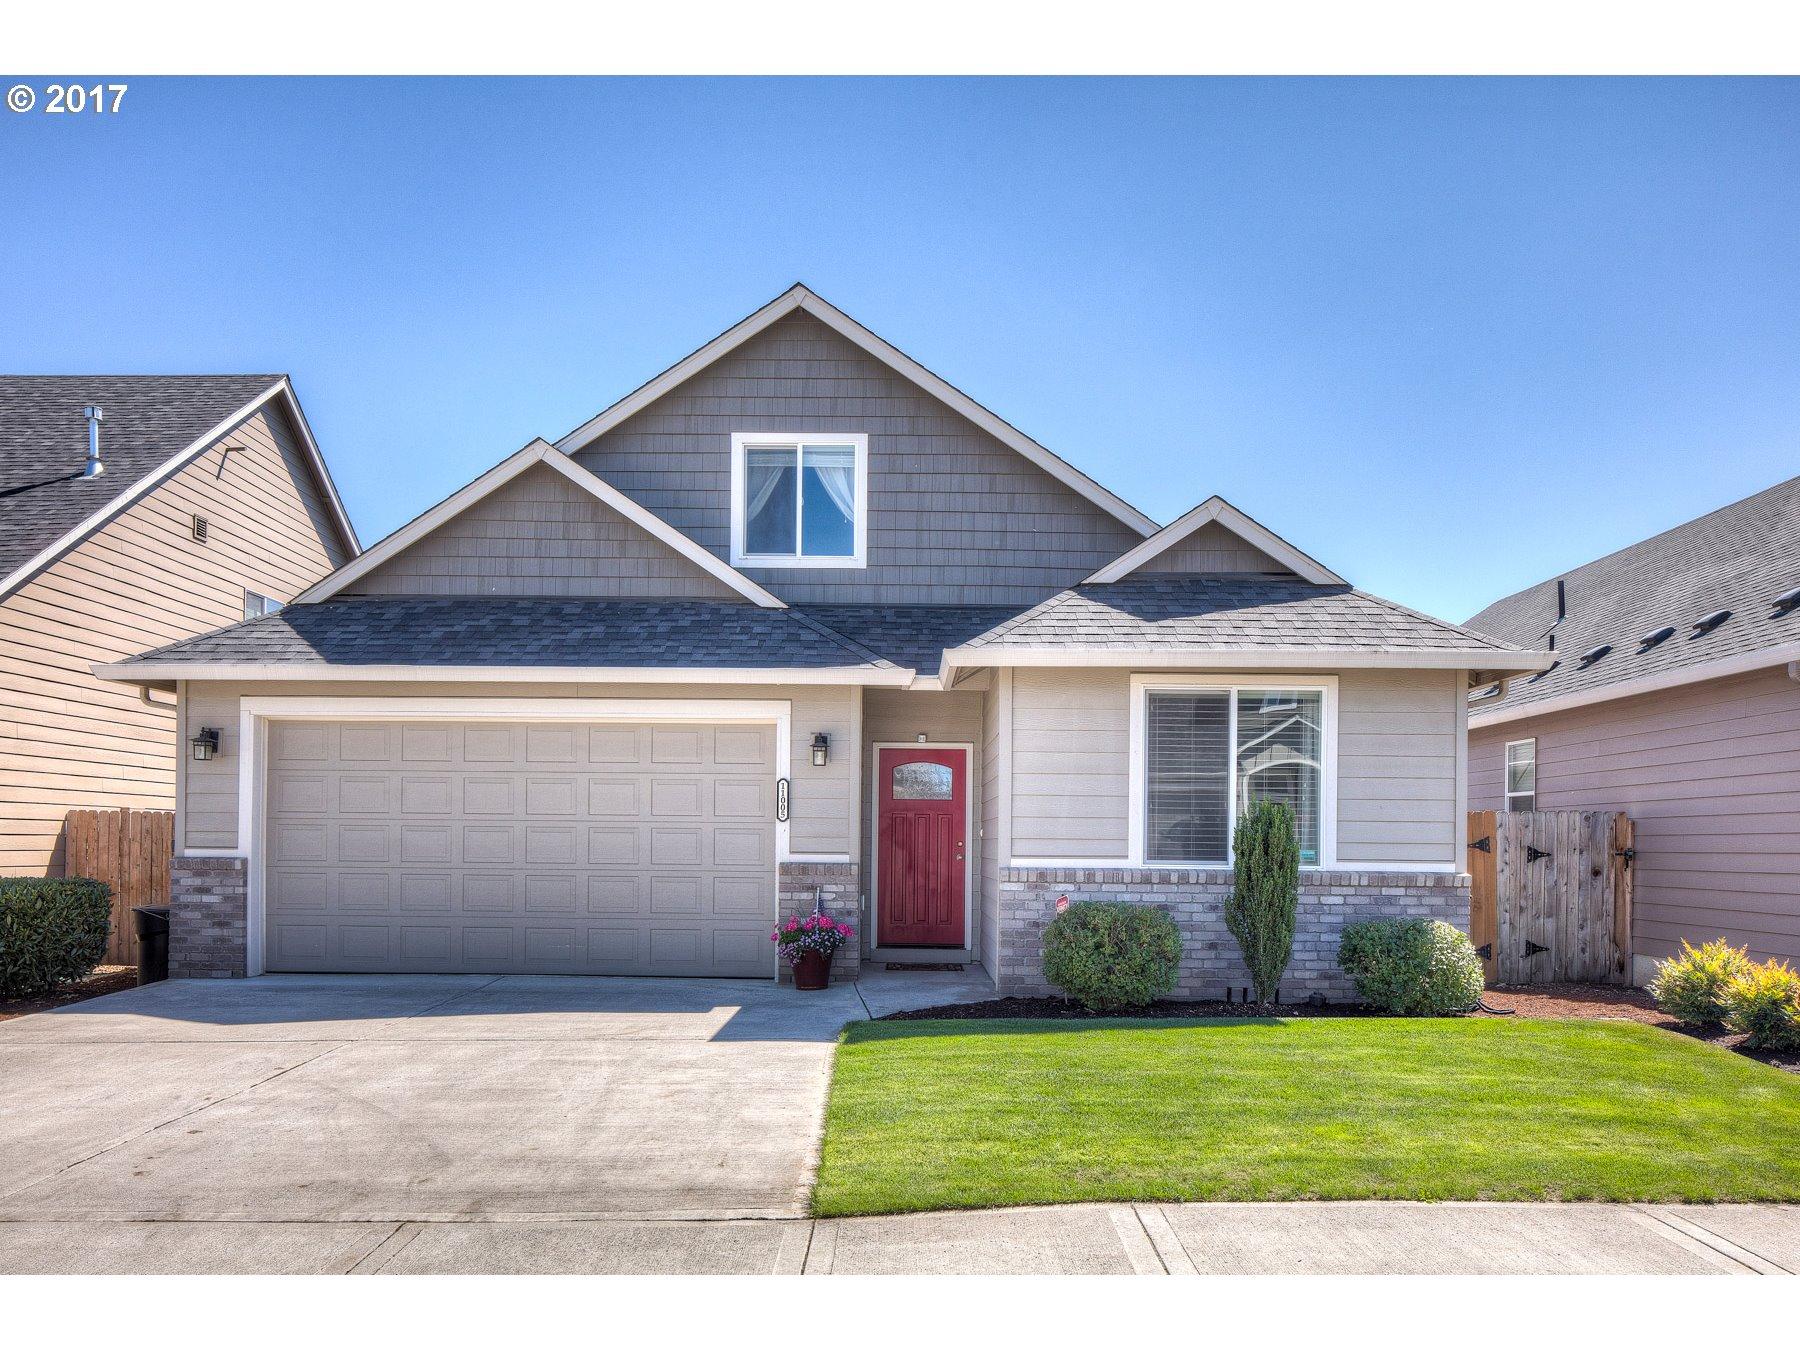 11005 NE 105 ST, Vancouver, WA 98662